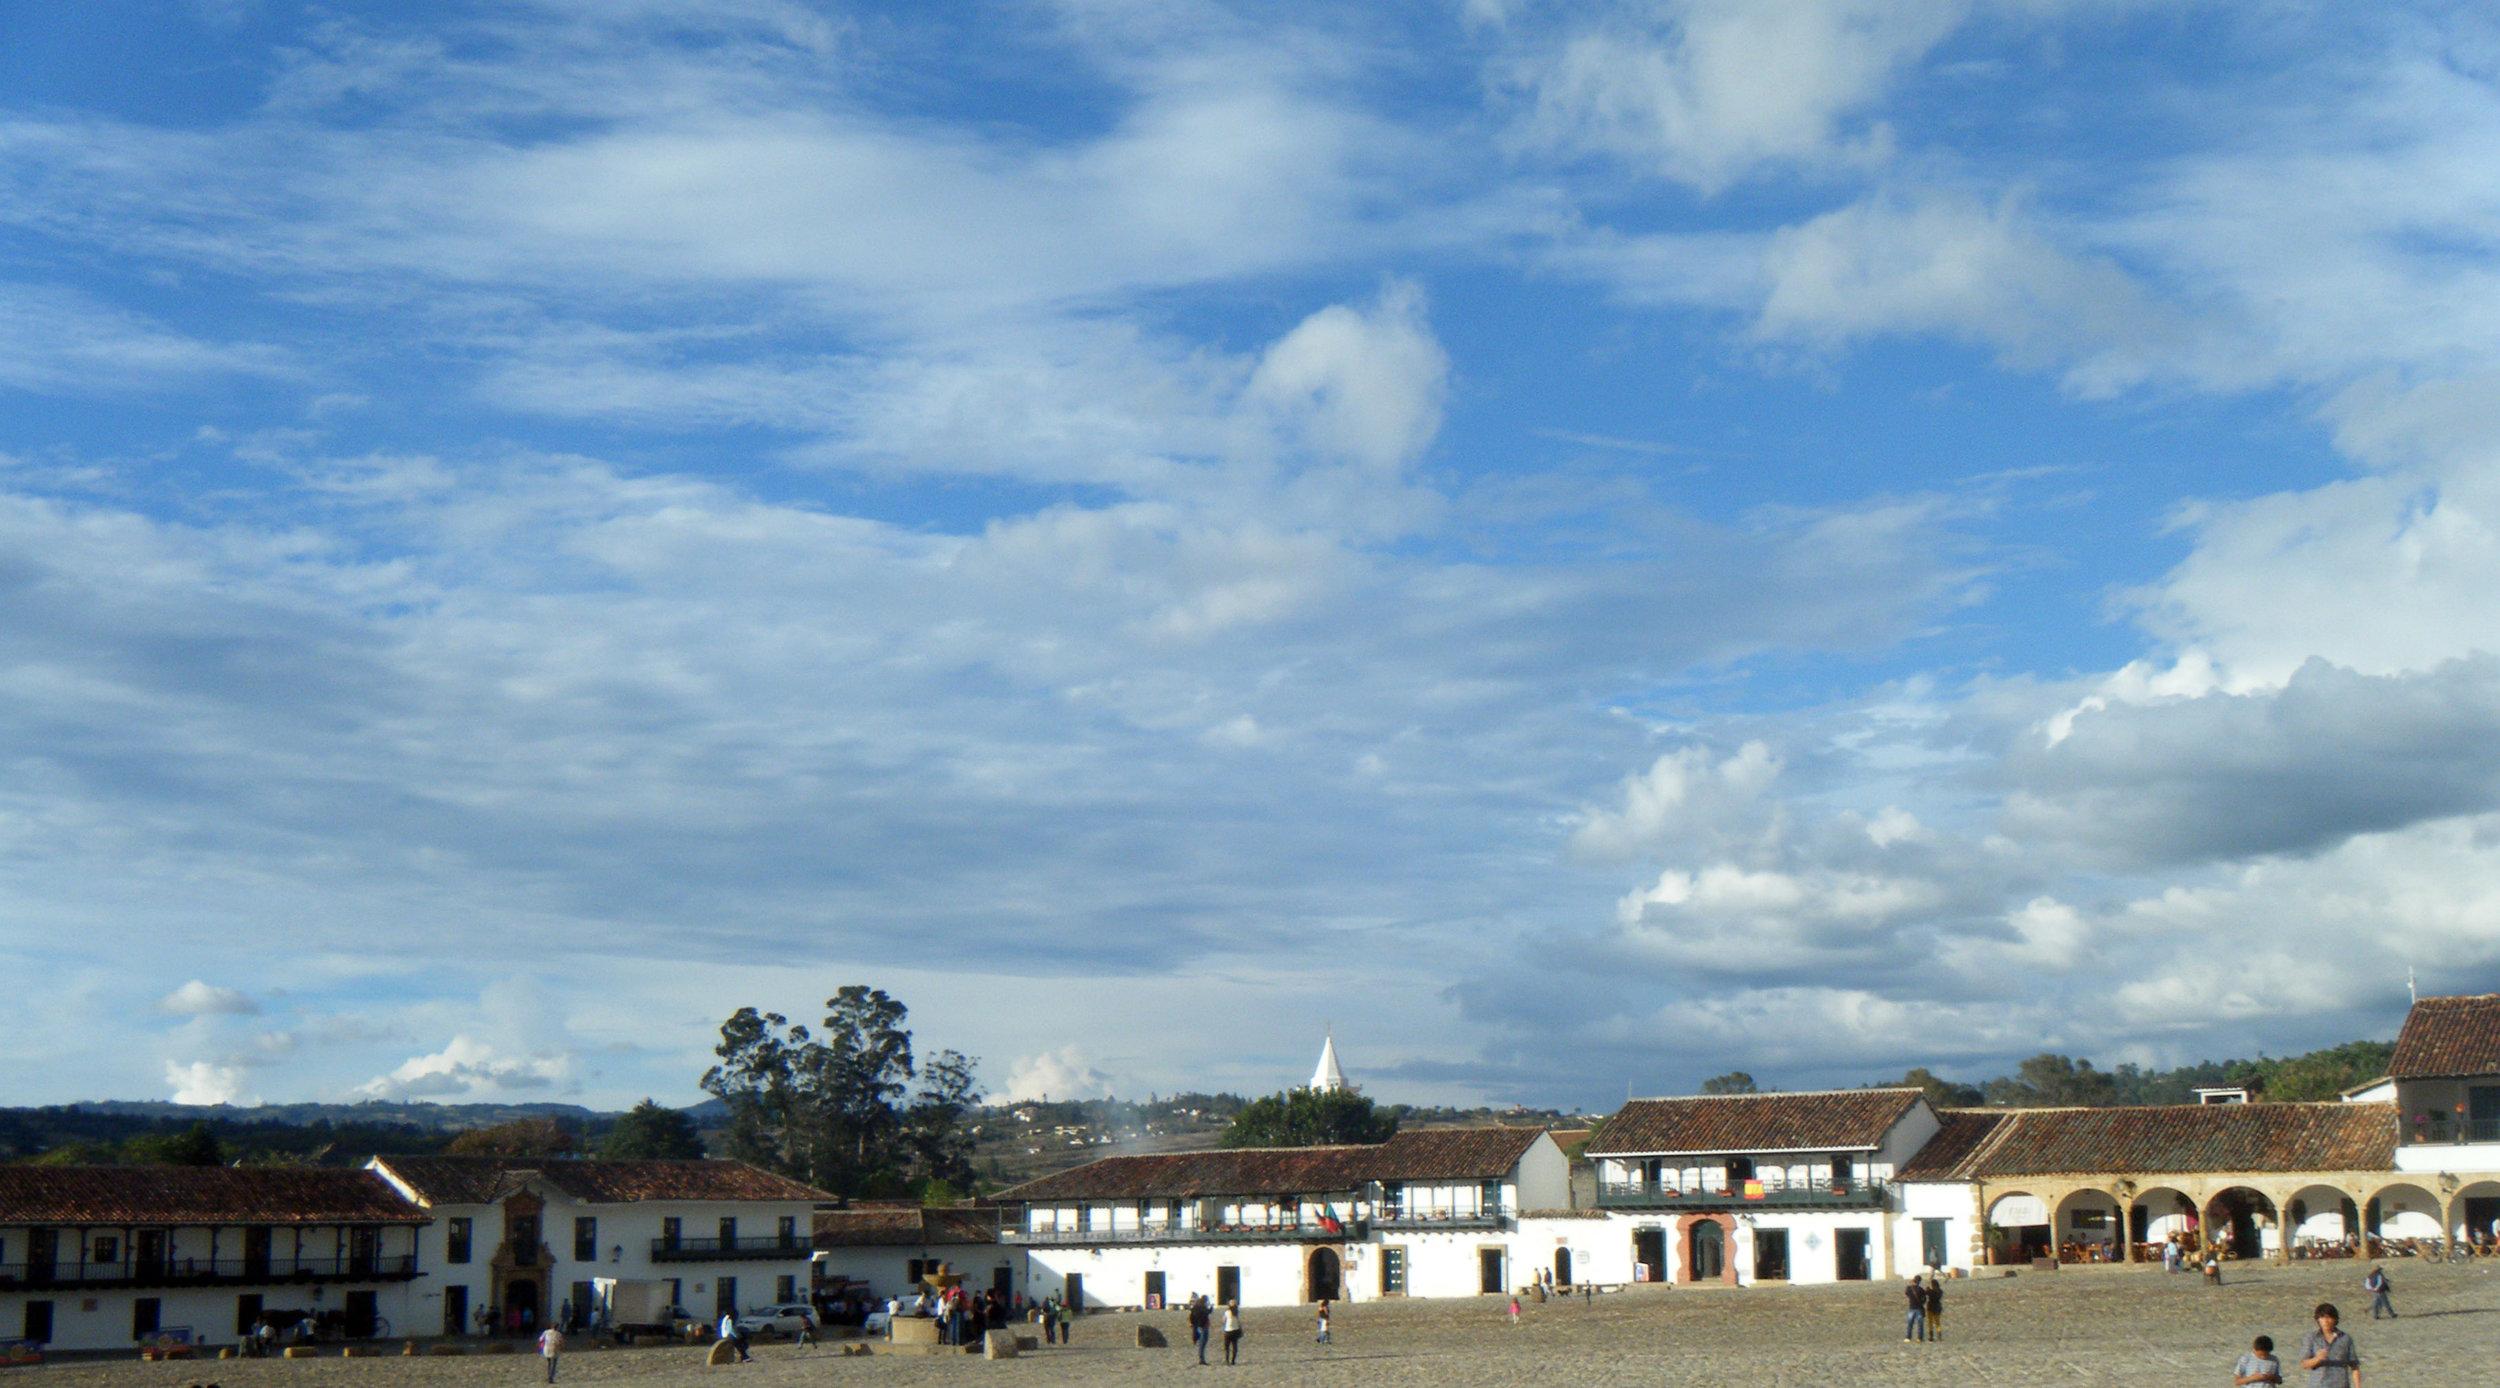 central plaza.jpg